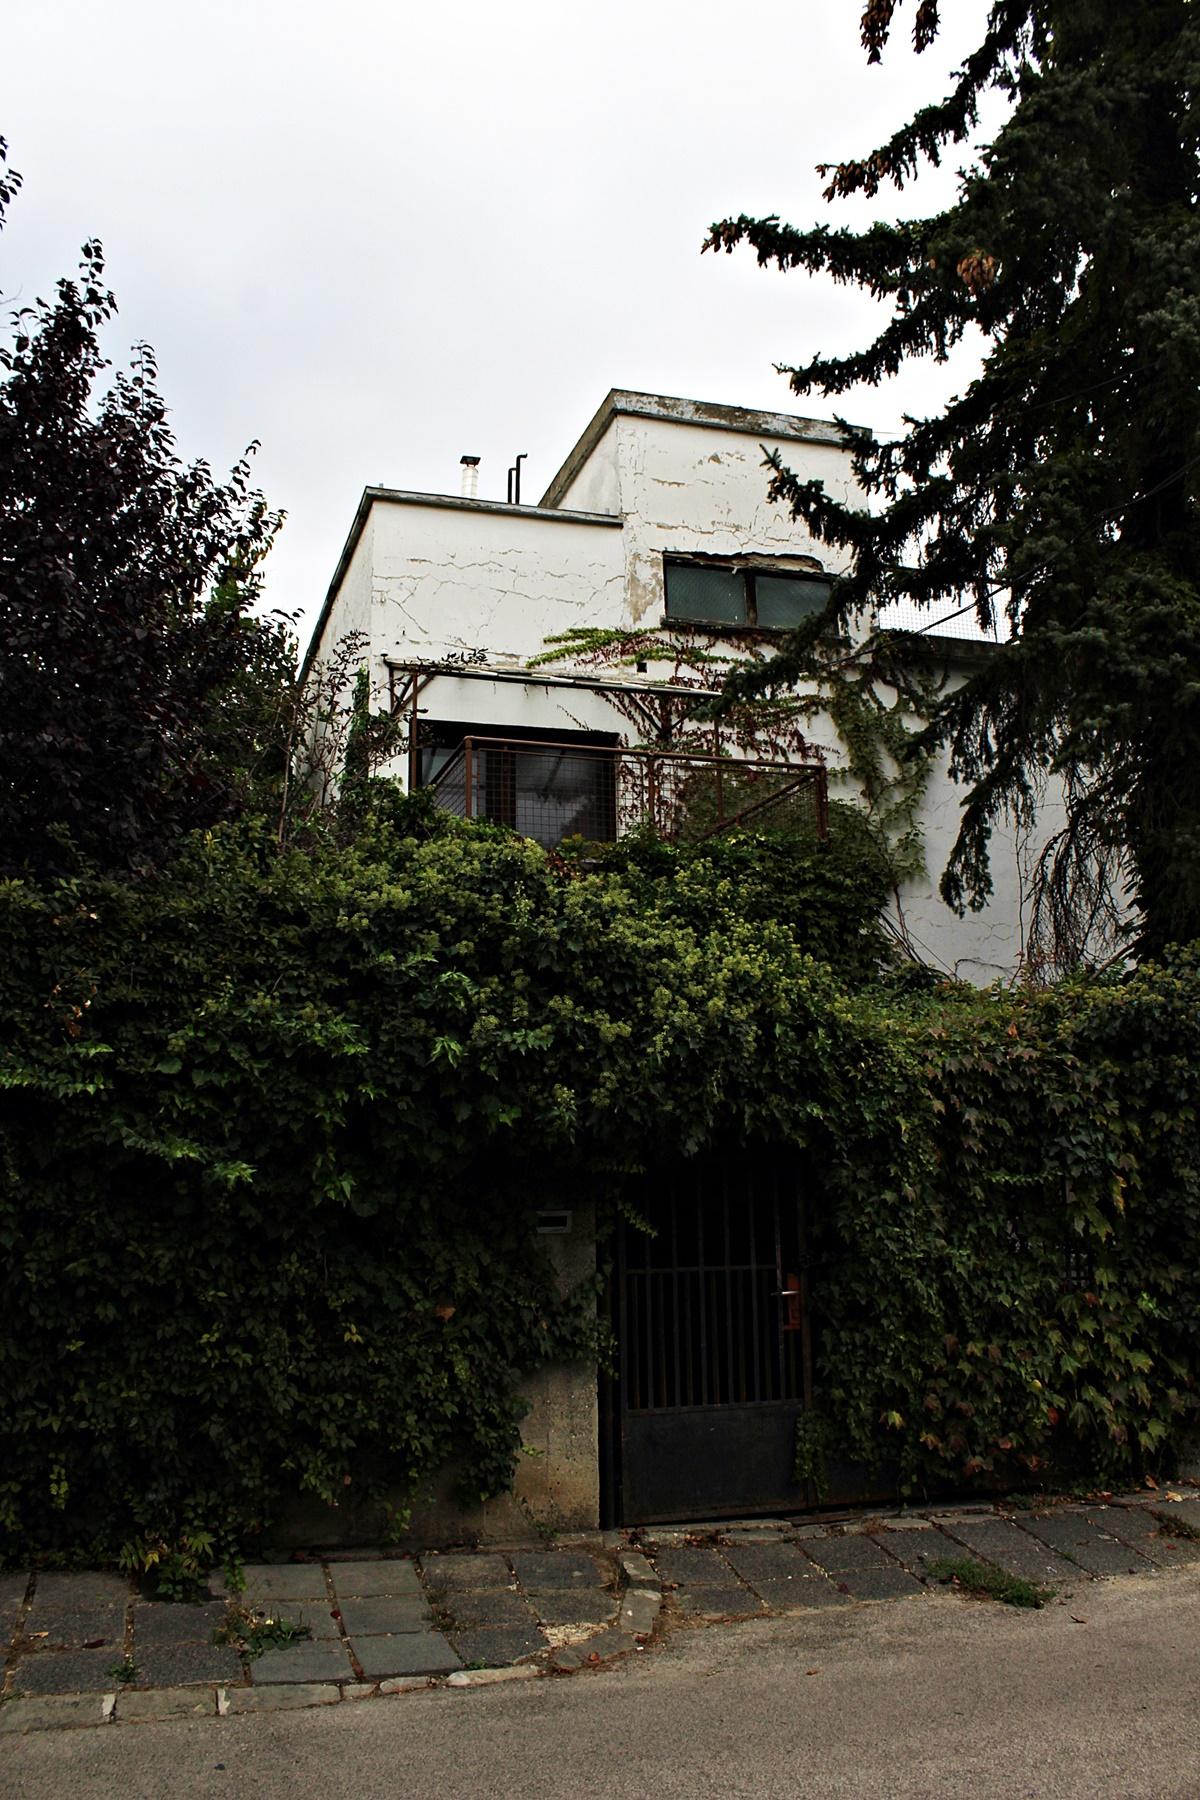 bauhaus-kiserleti-telep-napraforgo-utca-pasaret-mrfosterblog-4.JPG